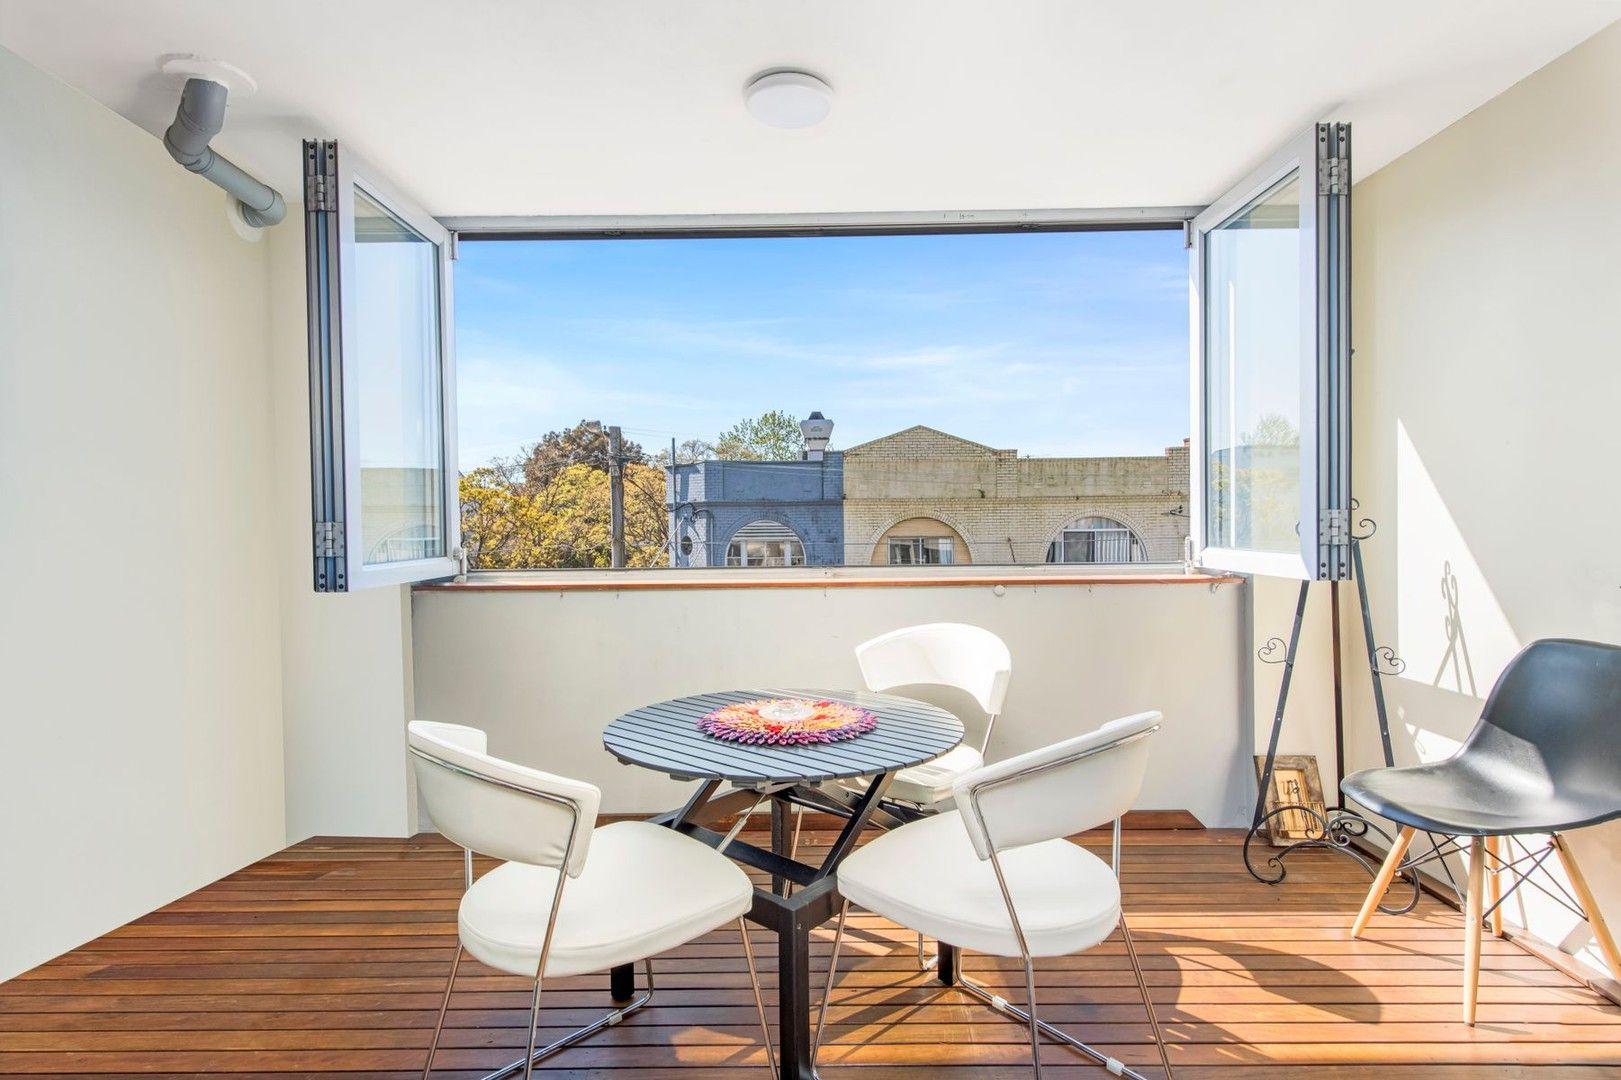 1 bedrooms Apartment / Unit / Flat in 206/7-9 Abbott Street CAMMERAY NSW, 2062